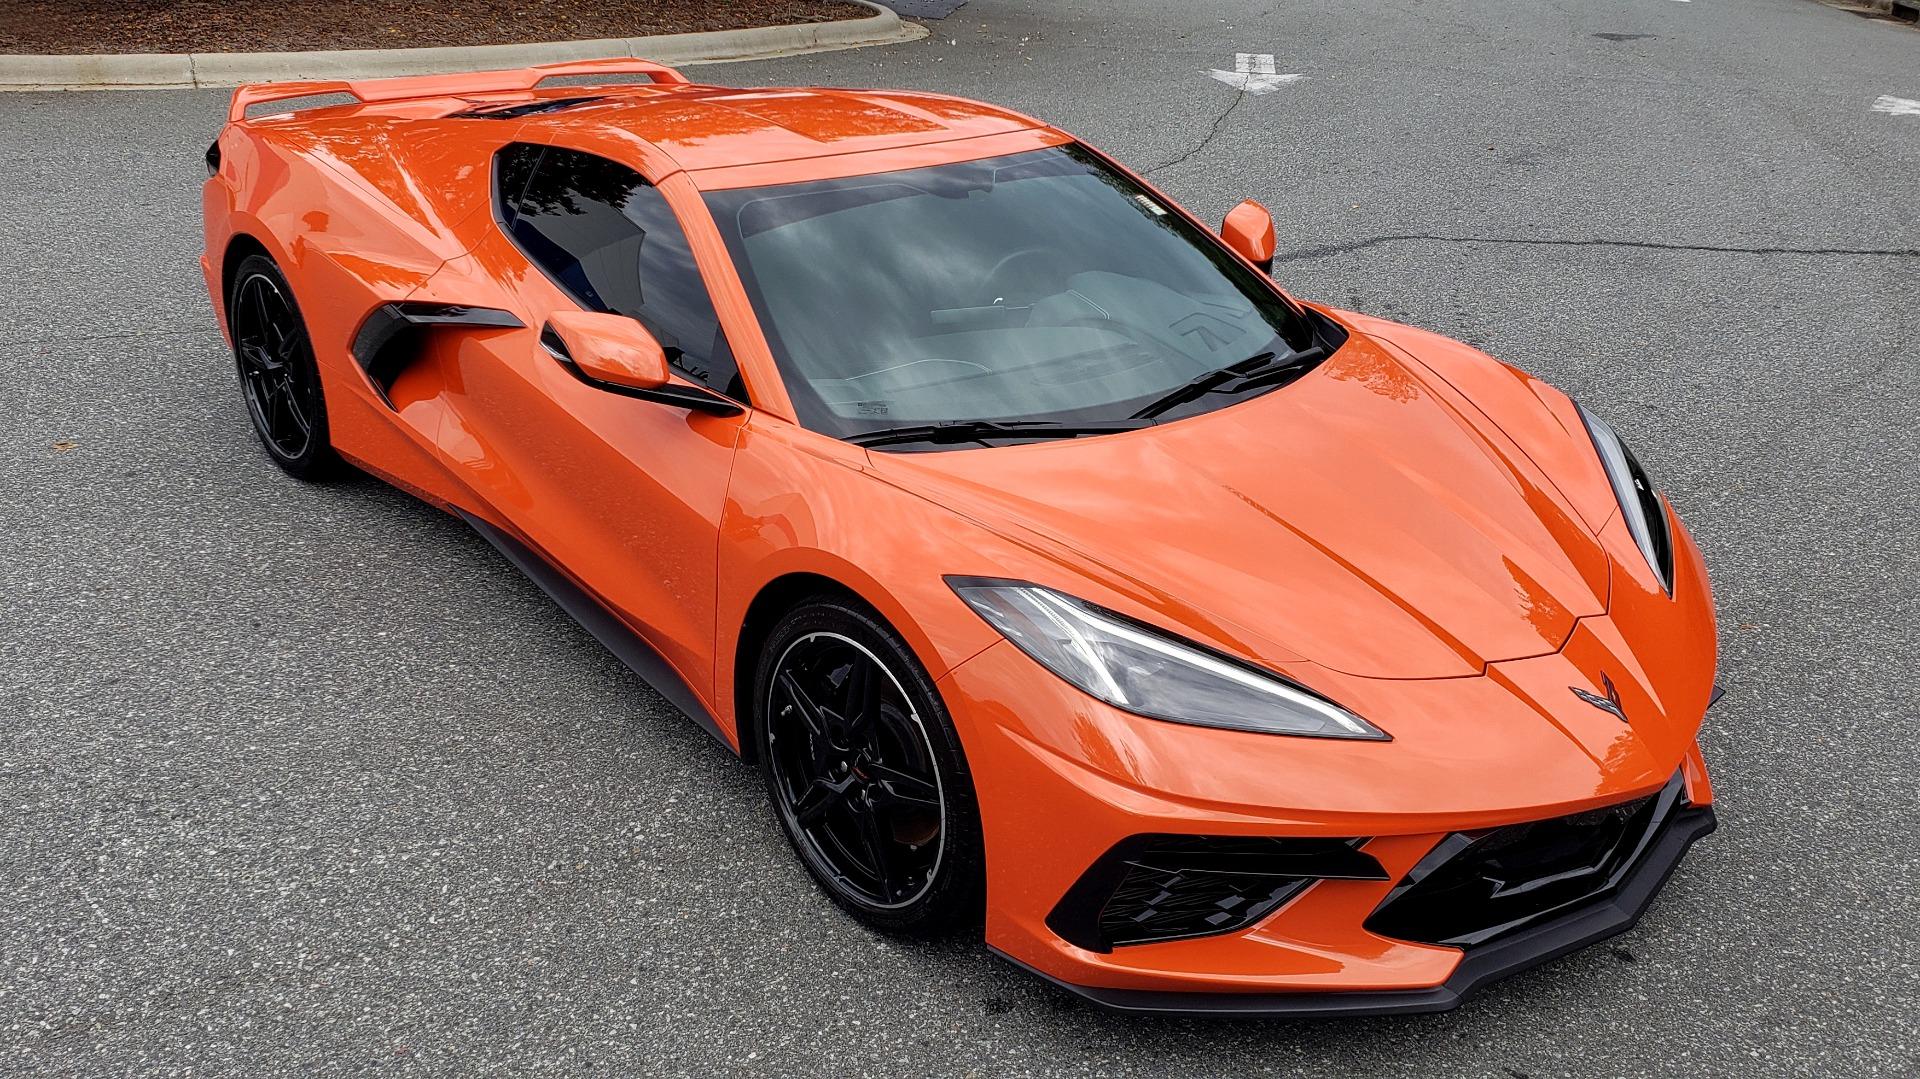 Used 2020 Chevrolet CORVETTE C8 STINGRAY 2LT / 6.2L V8 / 8-SPD AUTO / NAV / BOSE / REARVIEW / DATA RECOR for sale Sold at Formula Imports in Charlotte NC 28227 13